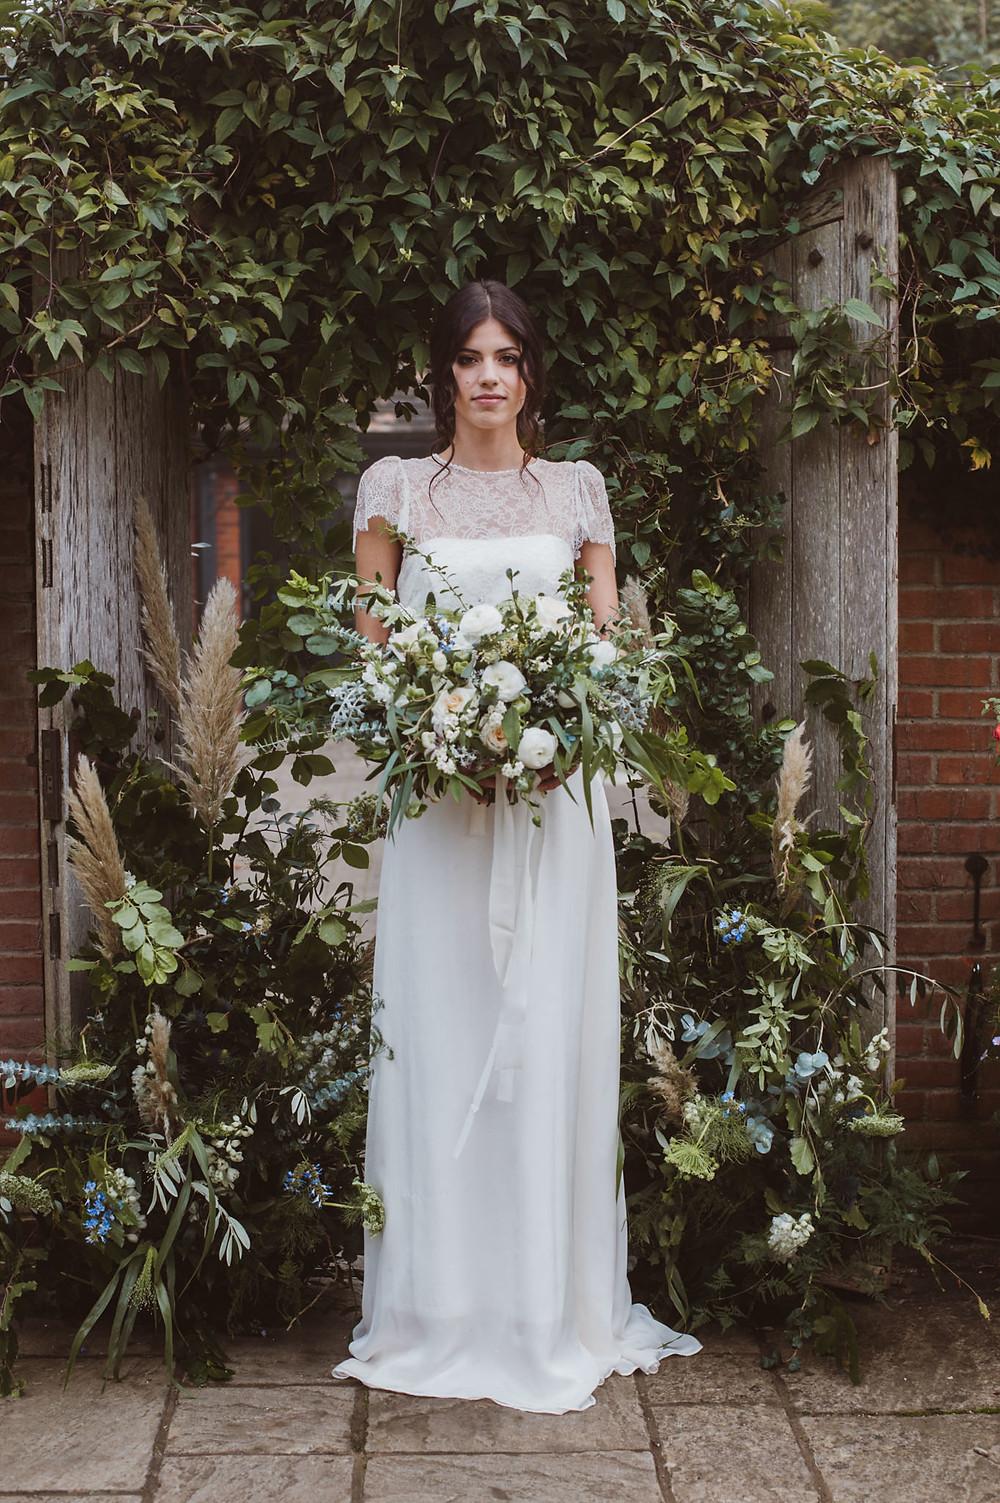 Sarah Harper Flowers and Bridal Dress by Jessica Turner Designs